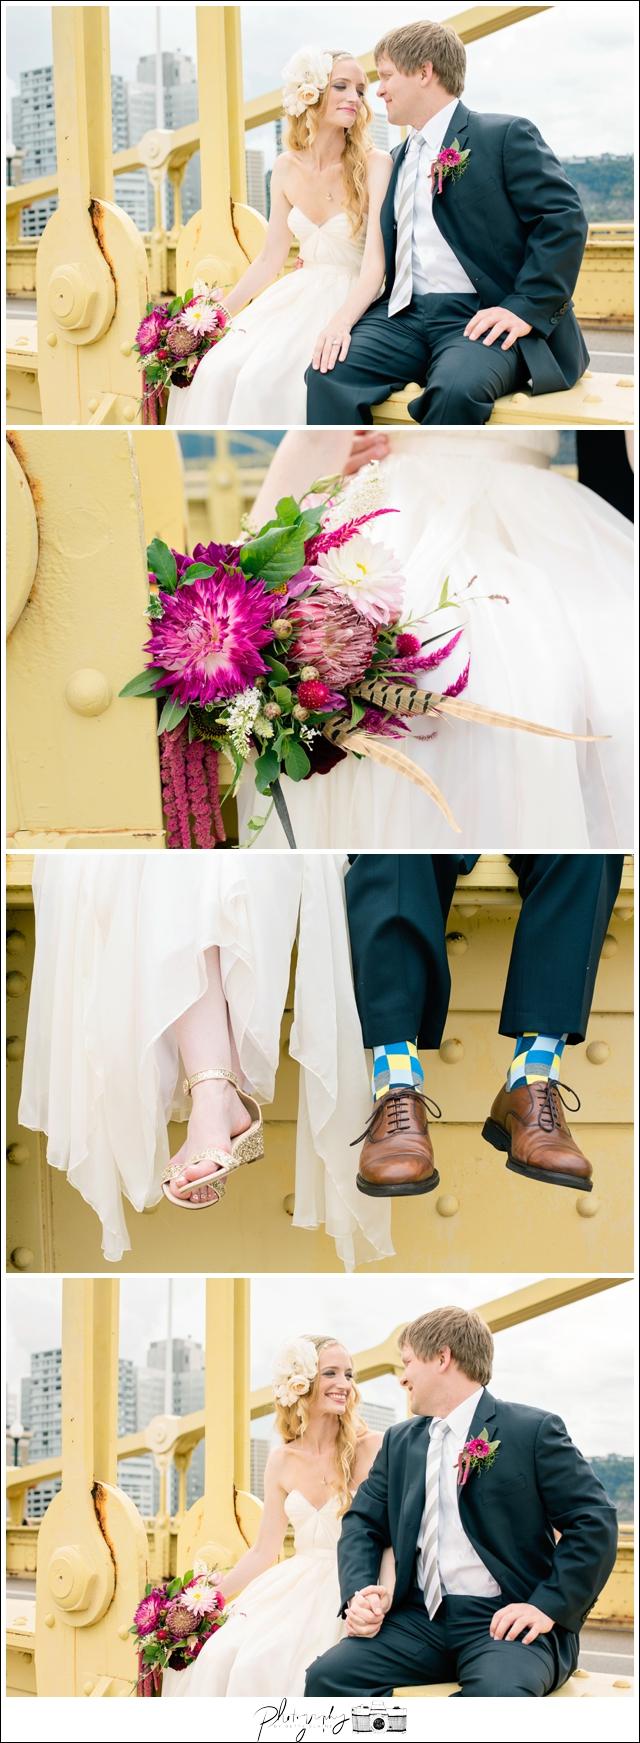 14-Pittsburgh-Bride-Groom-Portraits-Beautiful-Fun-Roberto-Clemente-Bridge-Destination-Wedding-Seattle-Wedding-Photographer